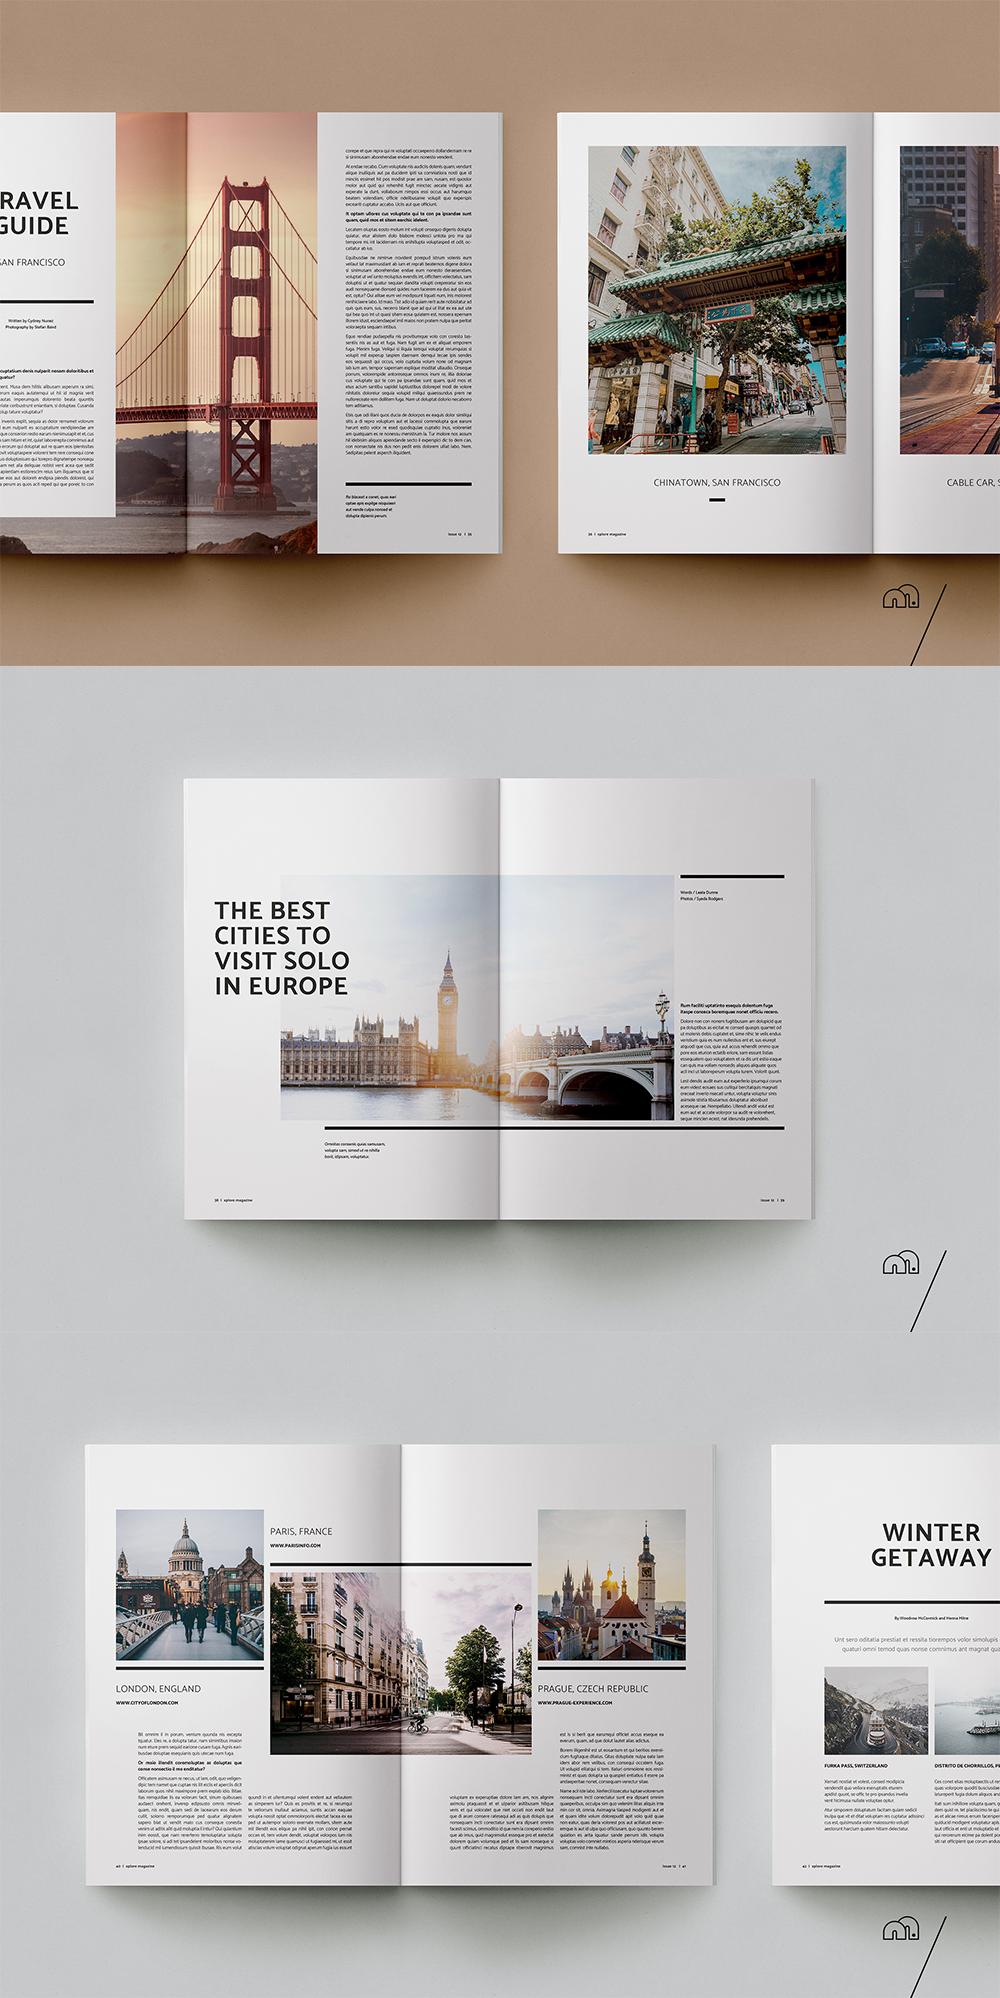 Xplore Travel Magazine In 2020 Travel Magazine Layout Magazine Layout Inspiration Magazine Layout Design